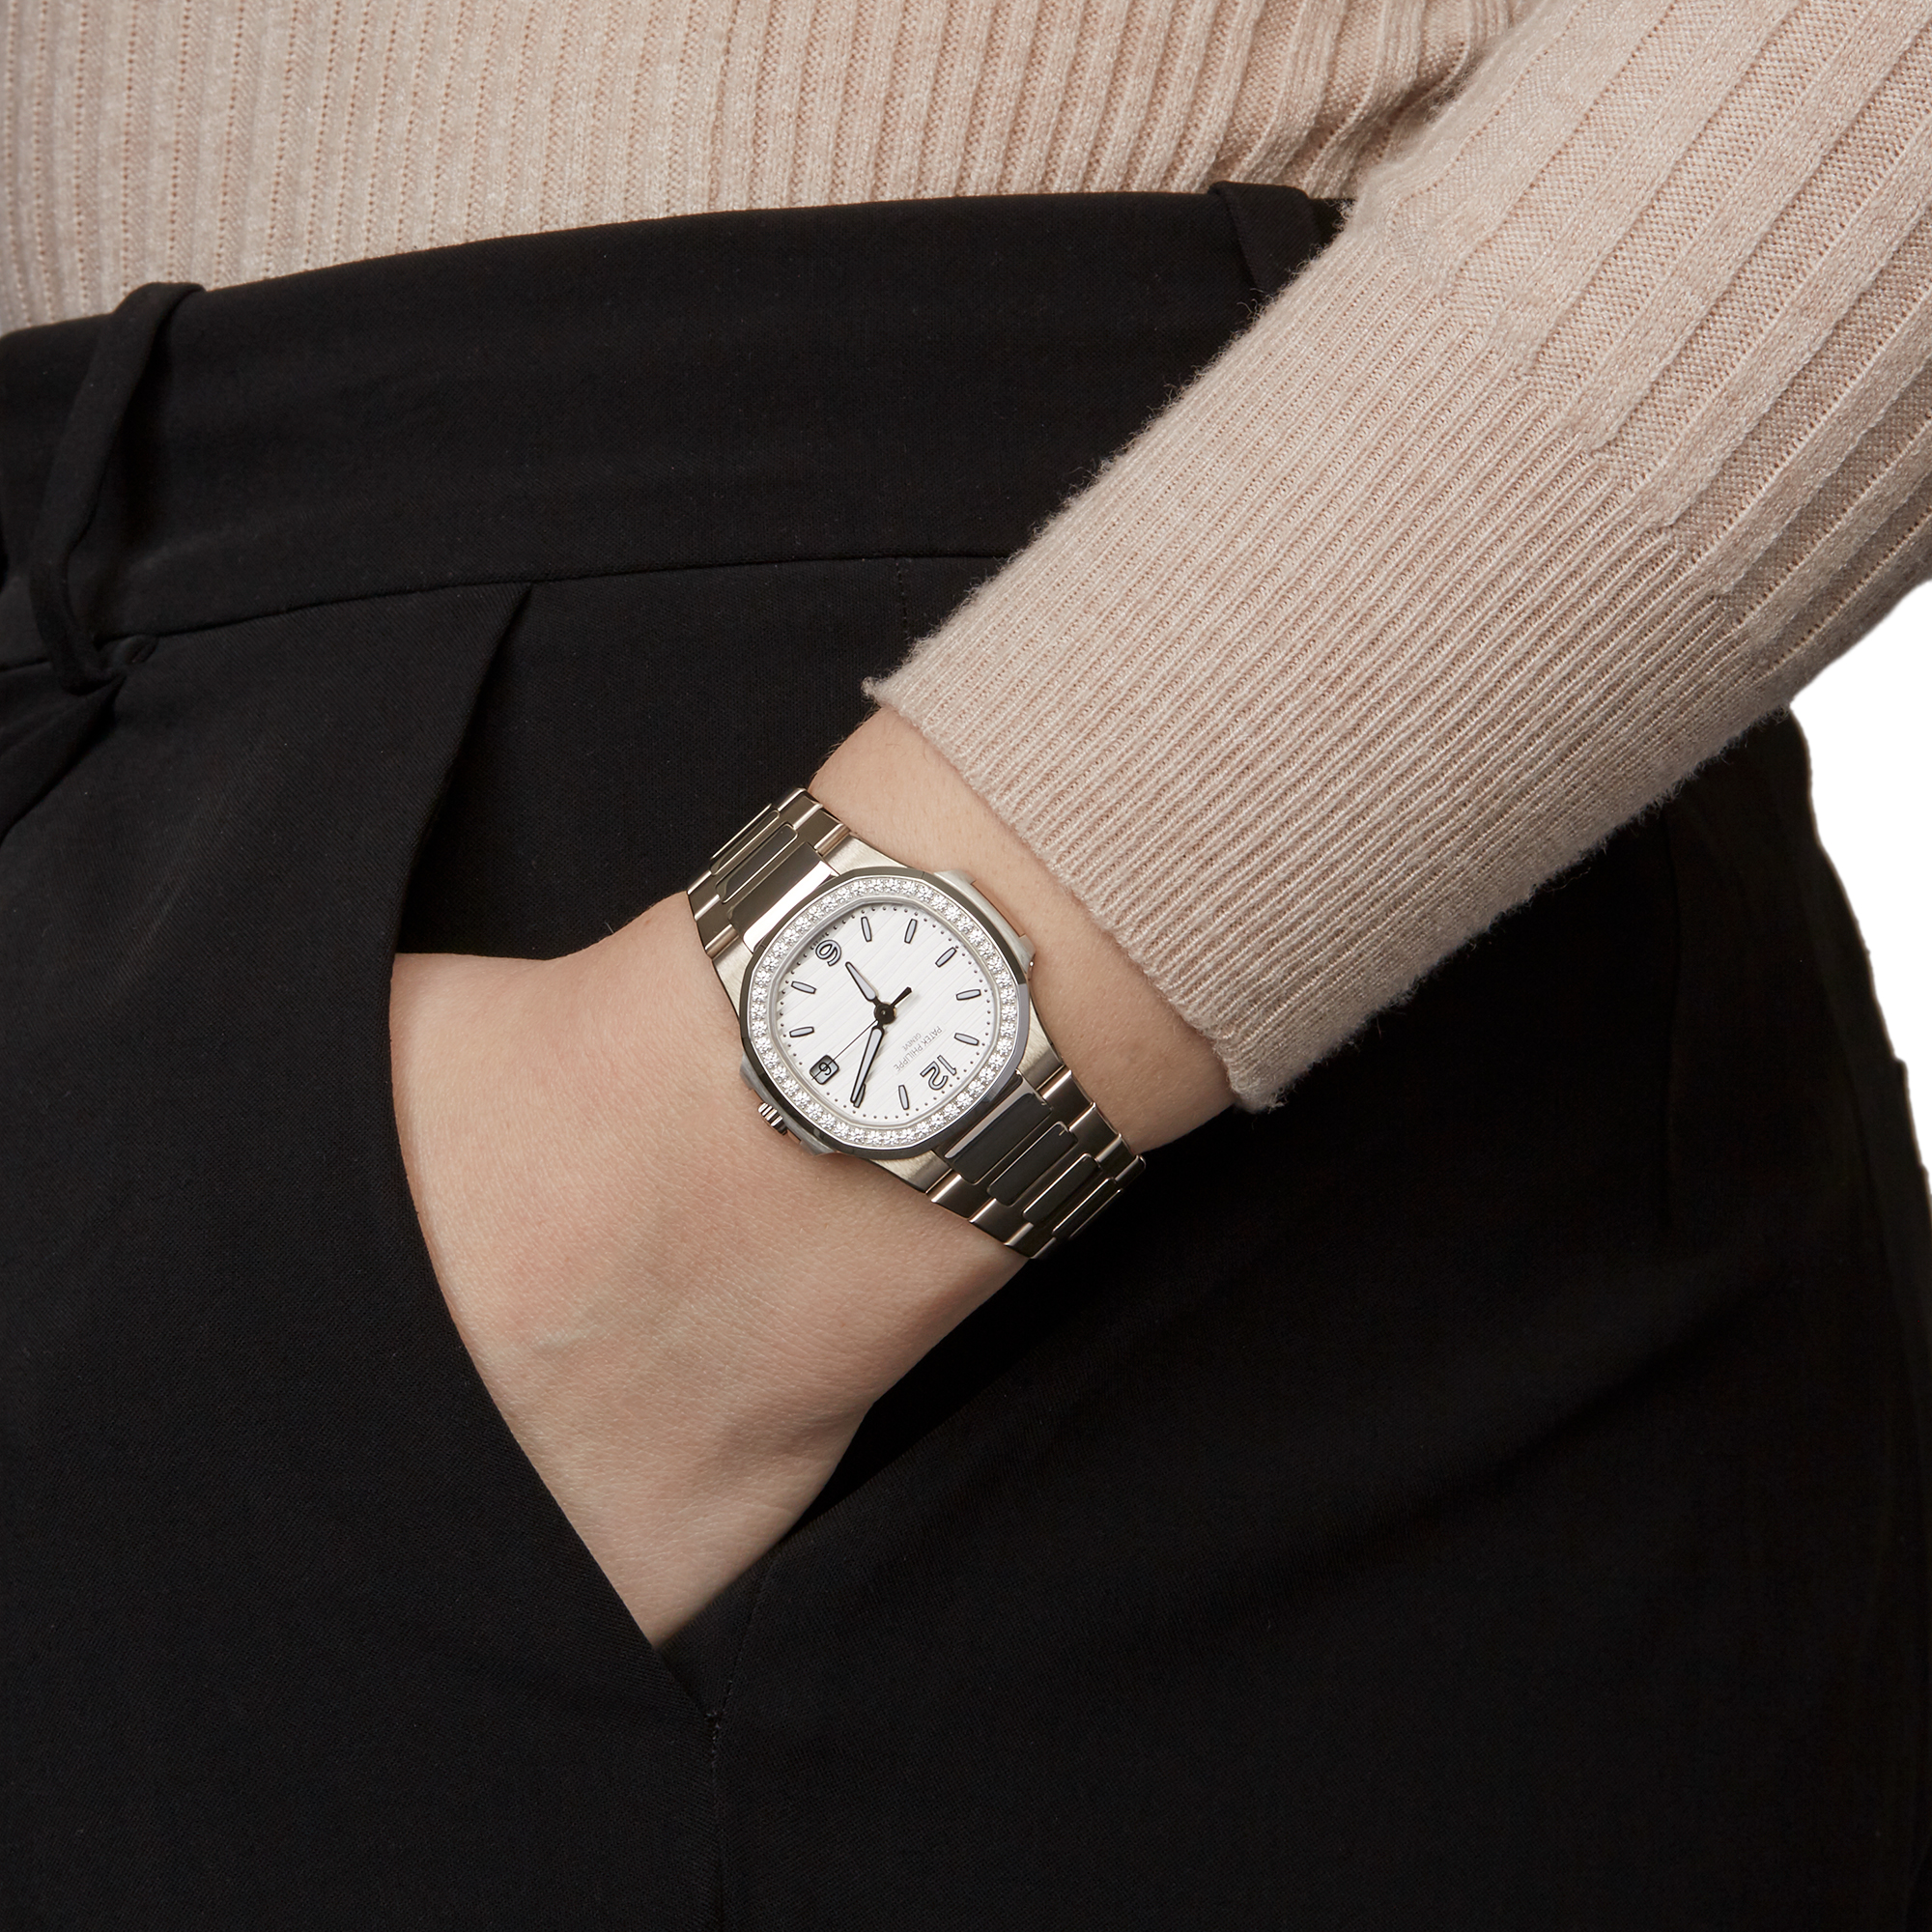 Patek Philippe Nautilus 7010G Ladies White Gold Diamond Watch - Image 2 of 8